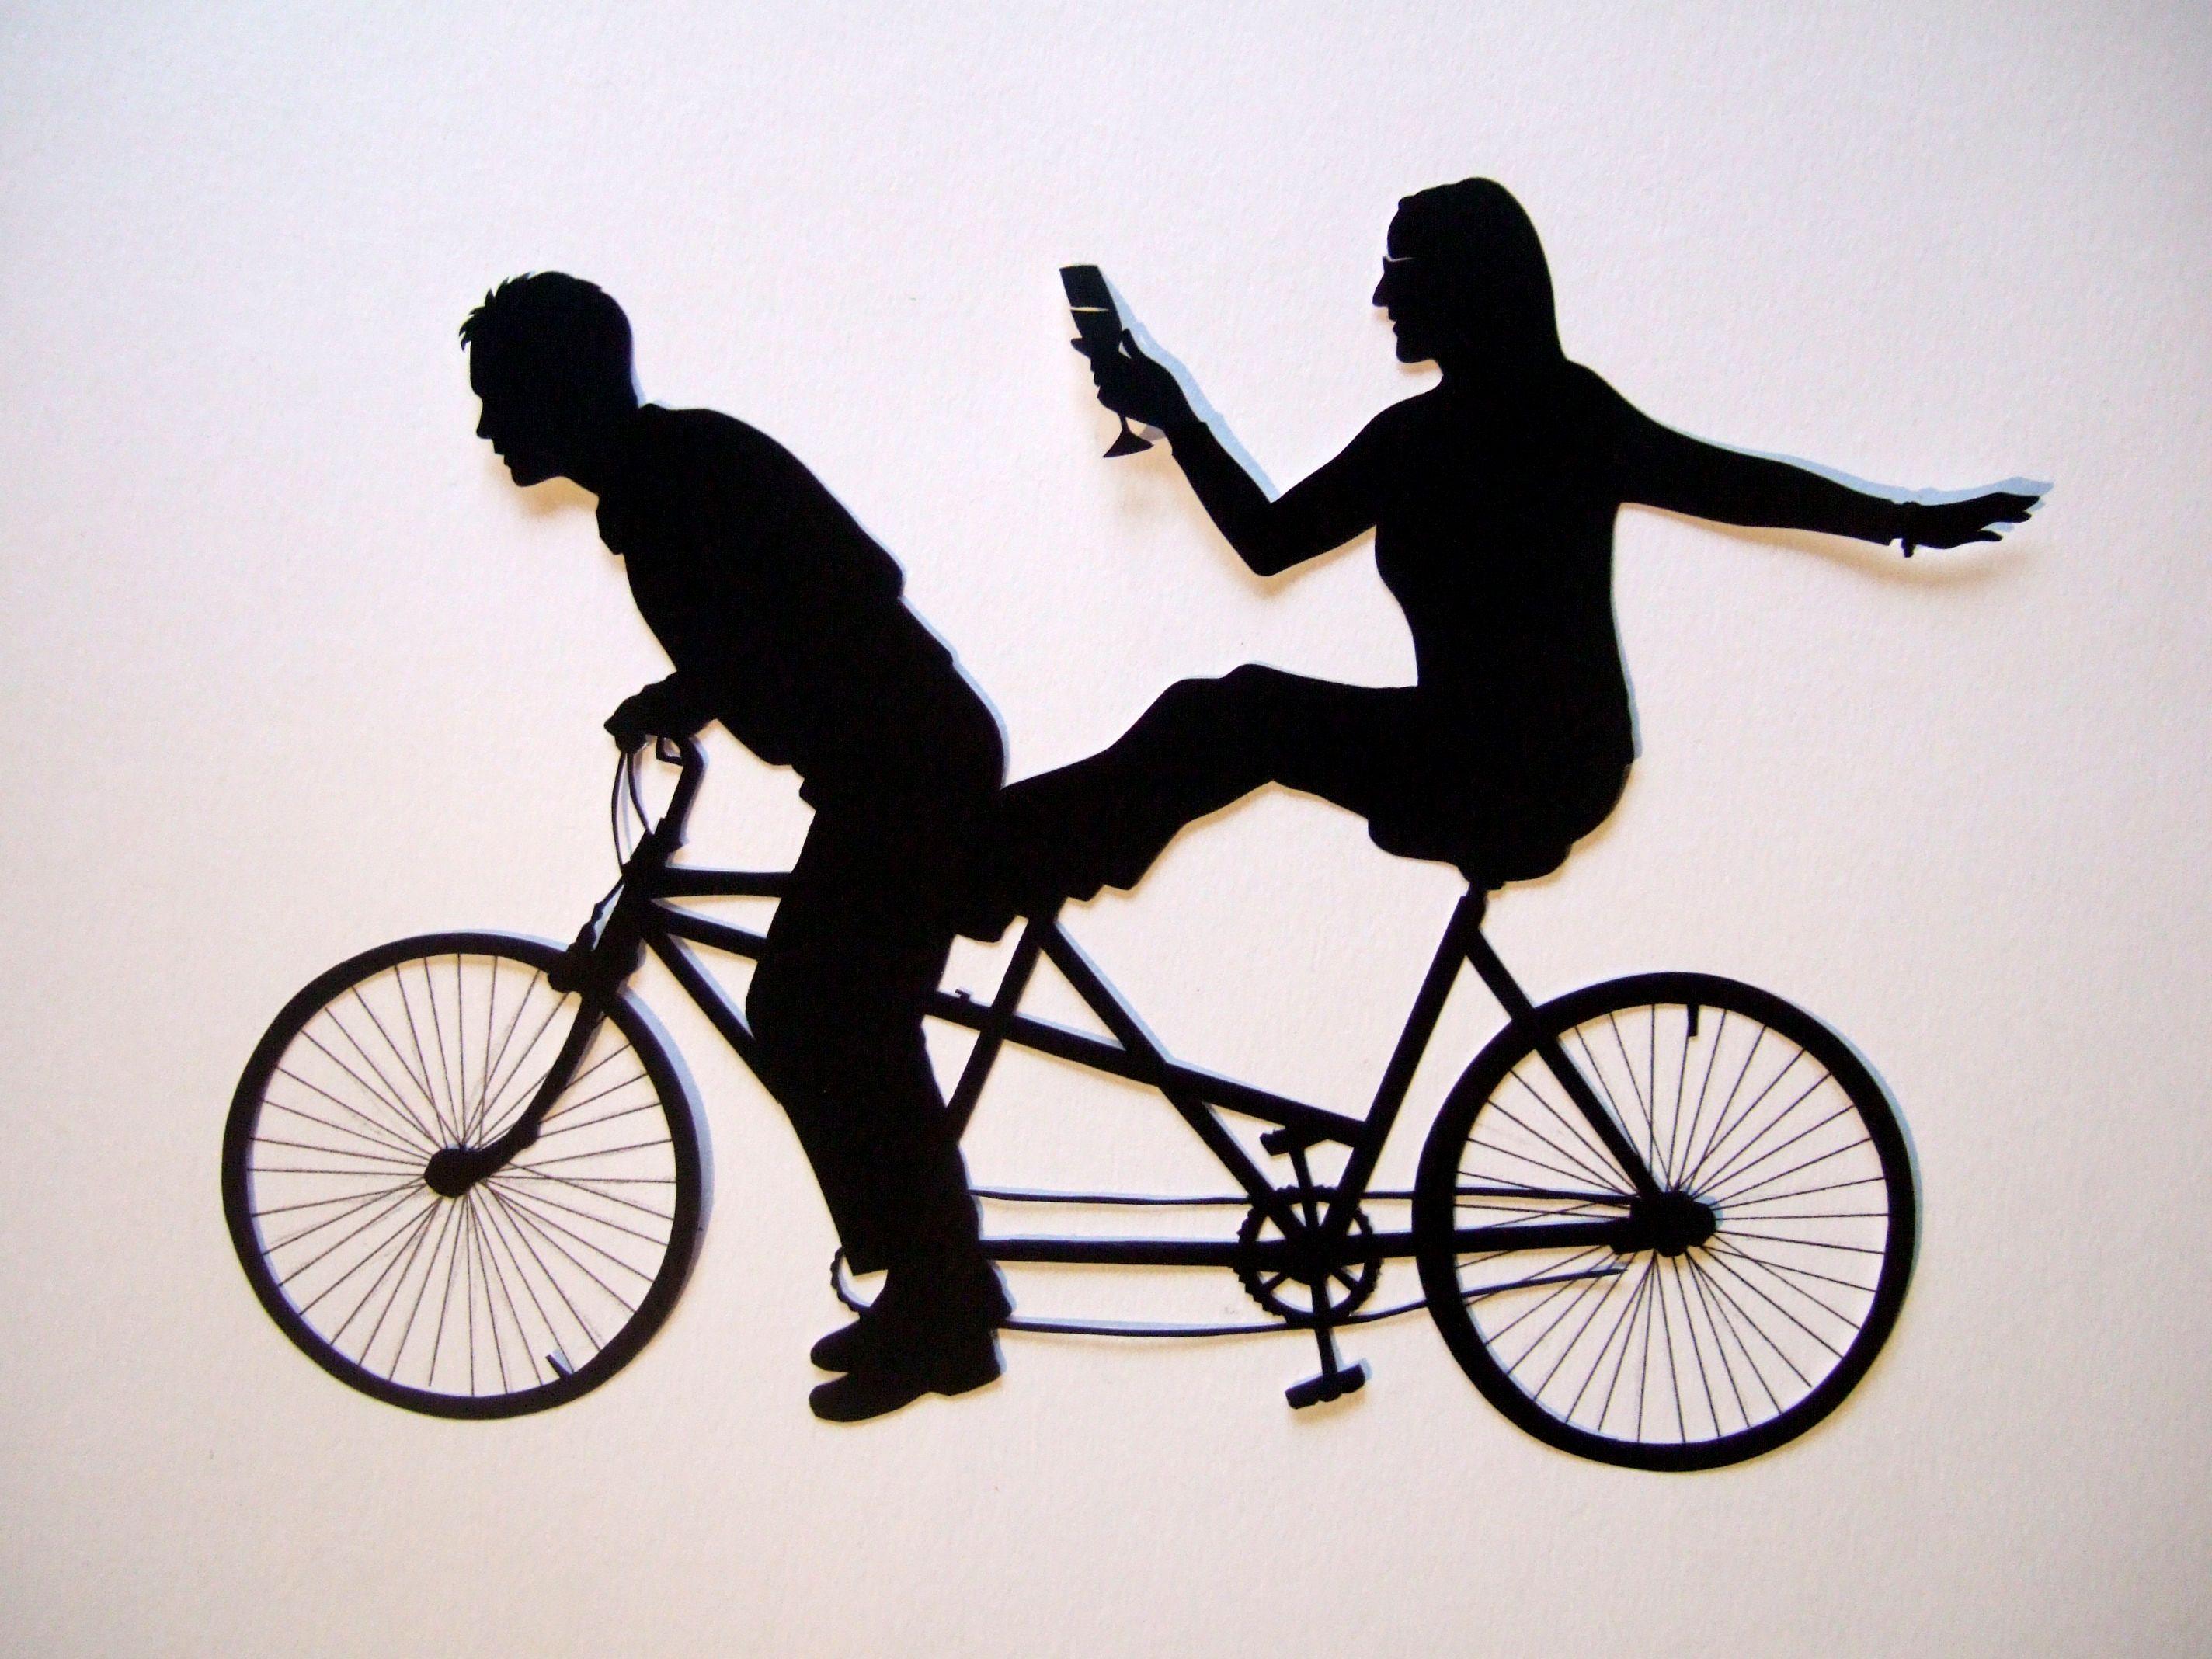 tandem mountain bike clipart - Google Search  b9381c1c8